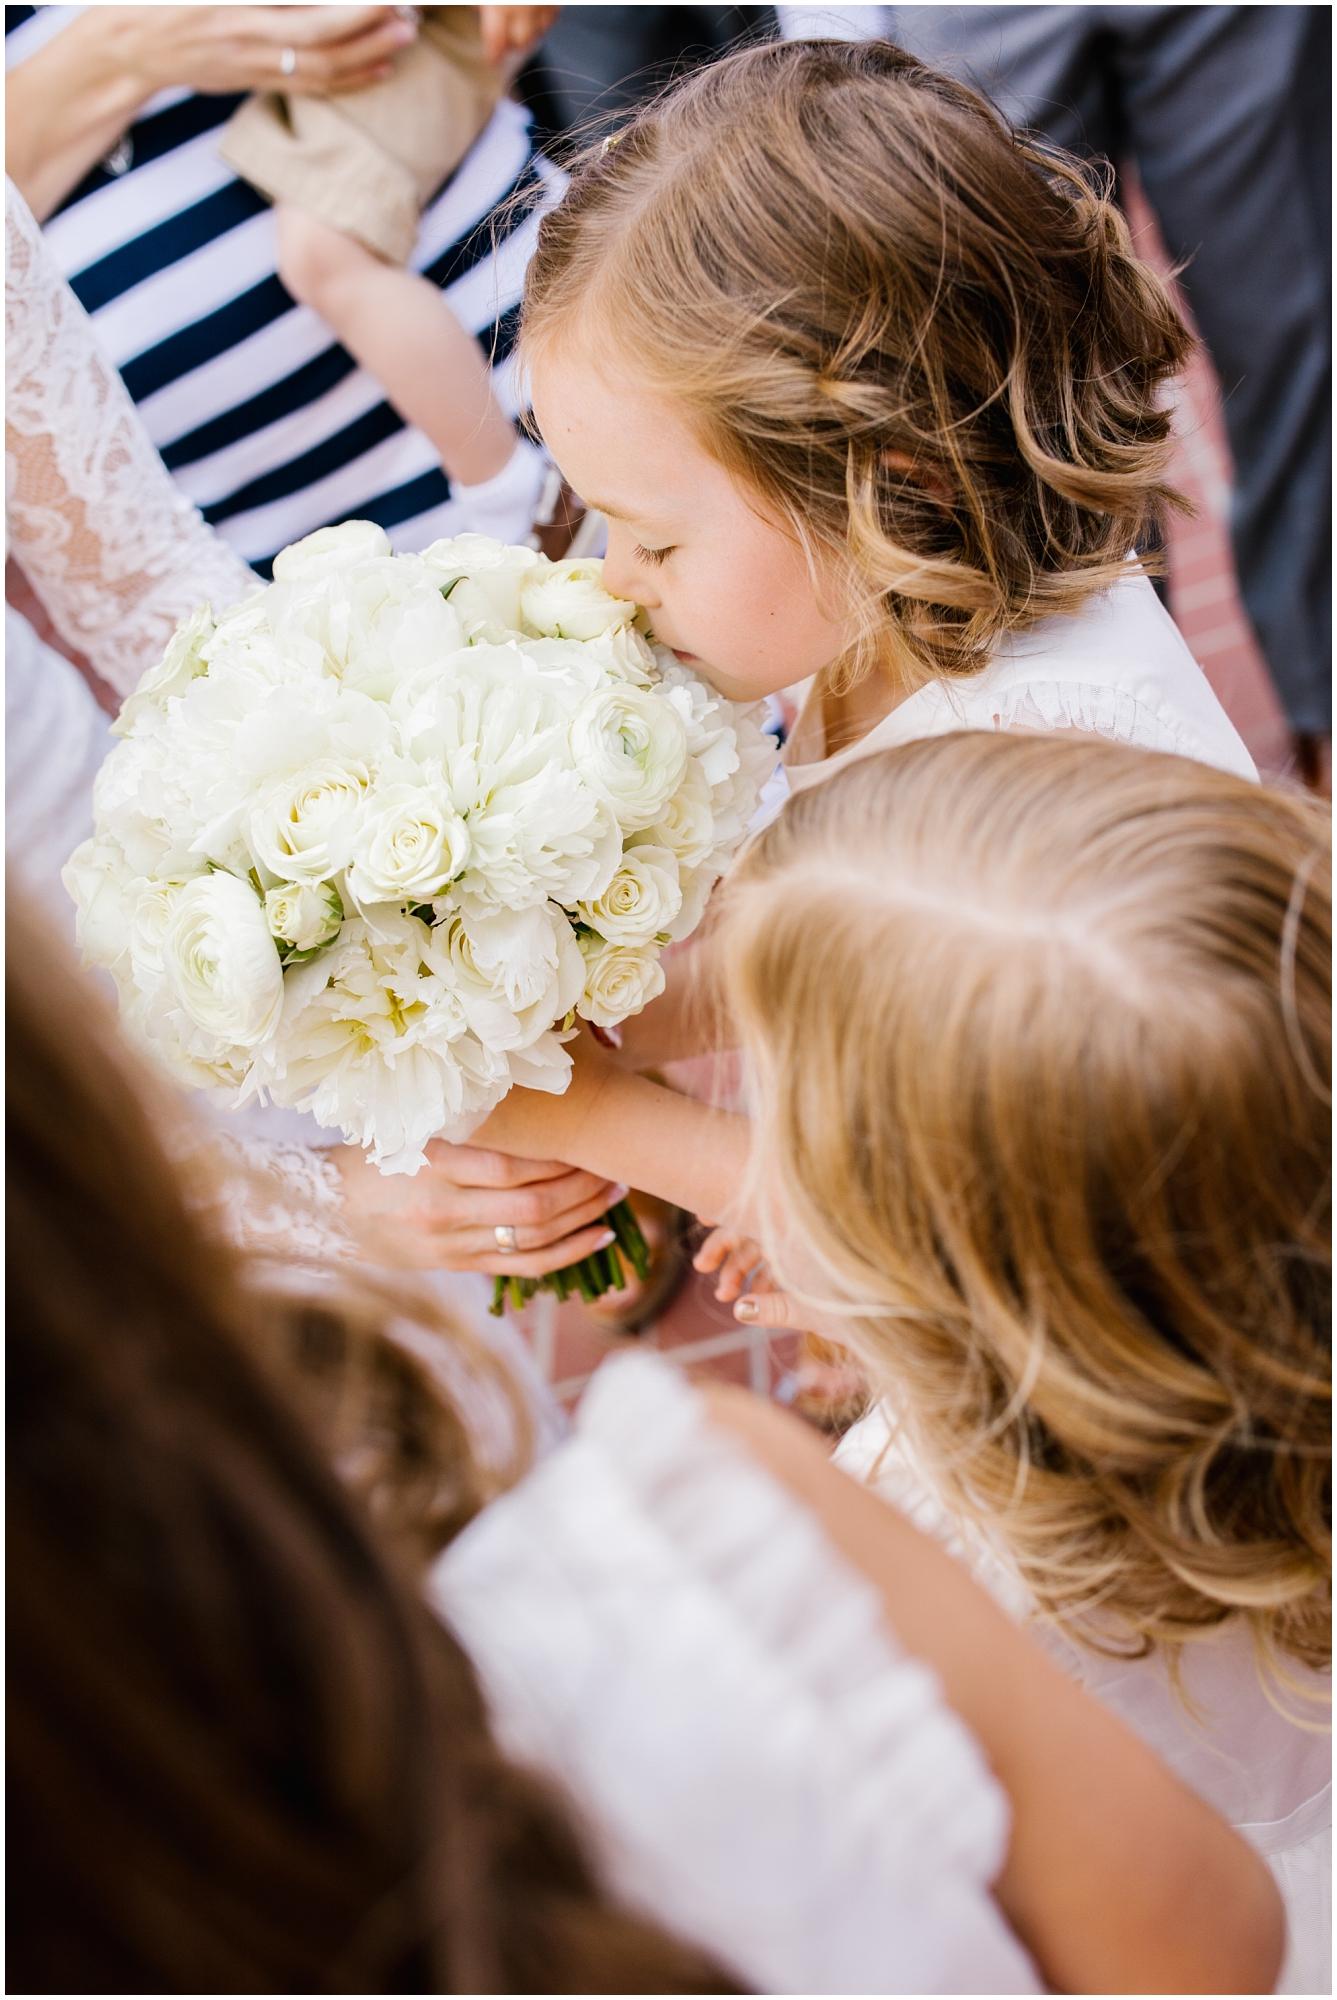 CherylandTyler-23_Lizzie-B-Imagery-Utah-Wedding-Photographer-Park-City-Salt-Lake-City-Temple-Wells-Fargo-Building.jpg